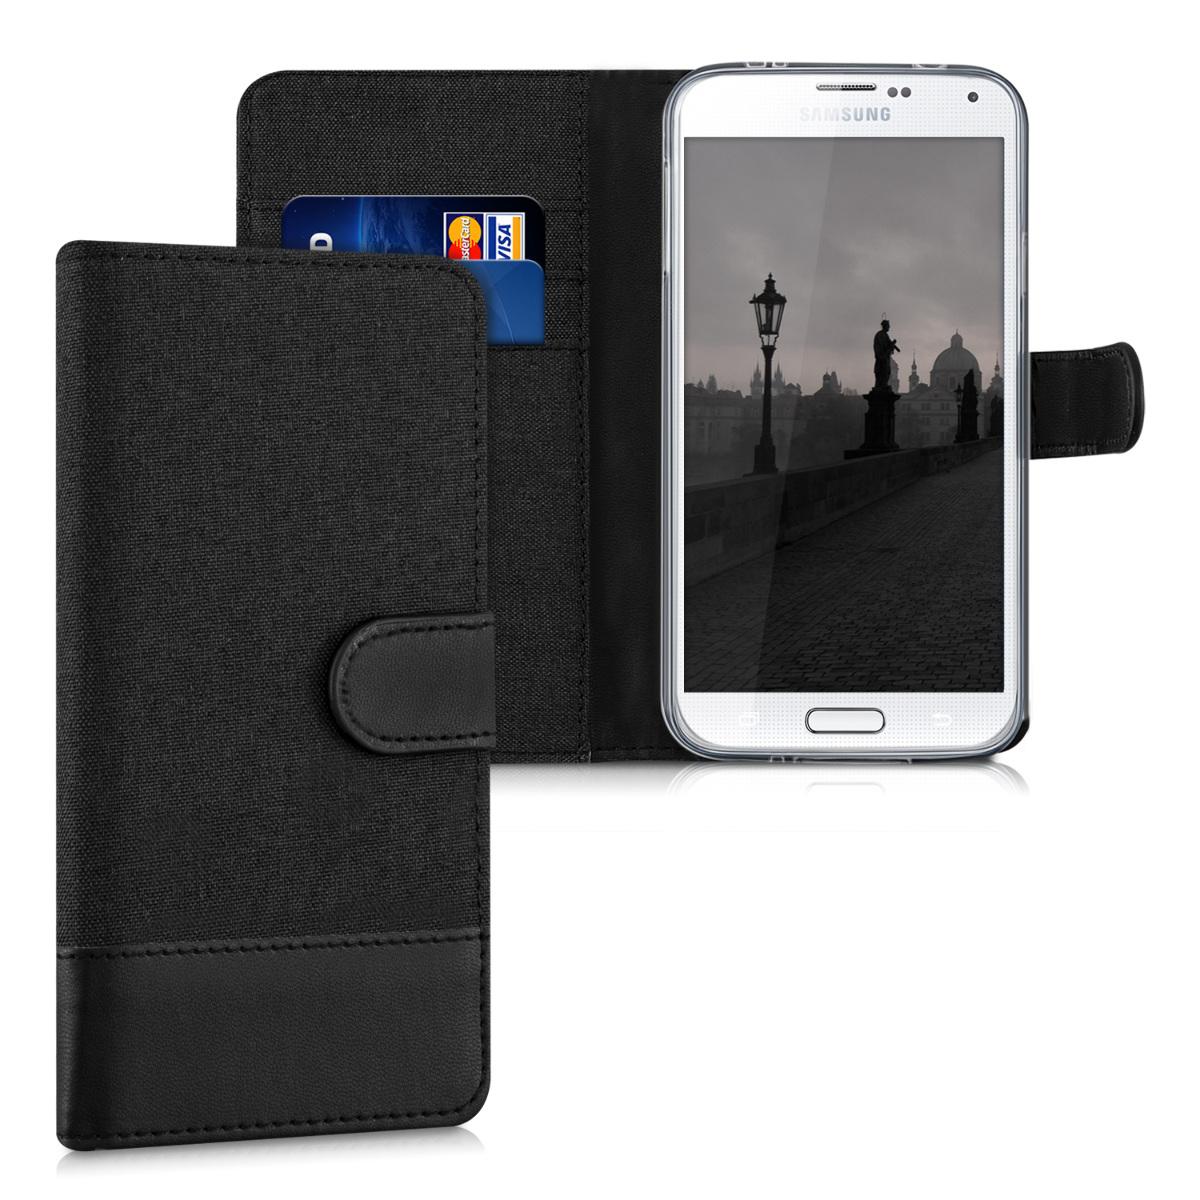 Fabricpouzdro pro Samsung S5 | S5 Neo - Anthracite / černé